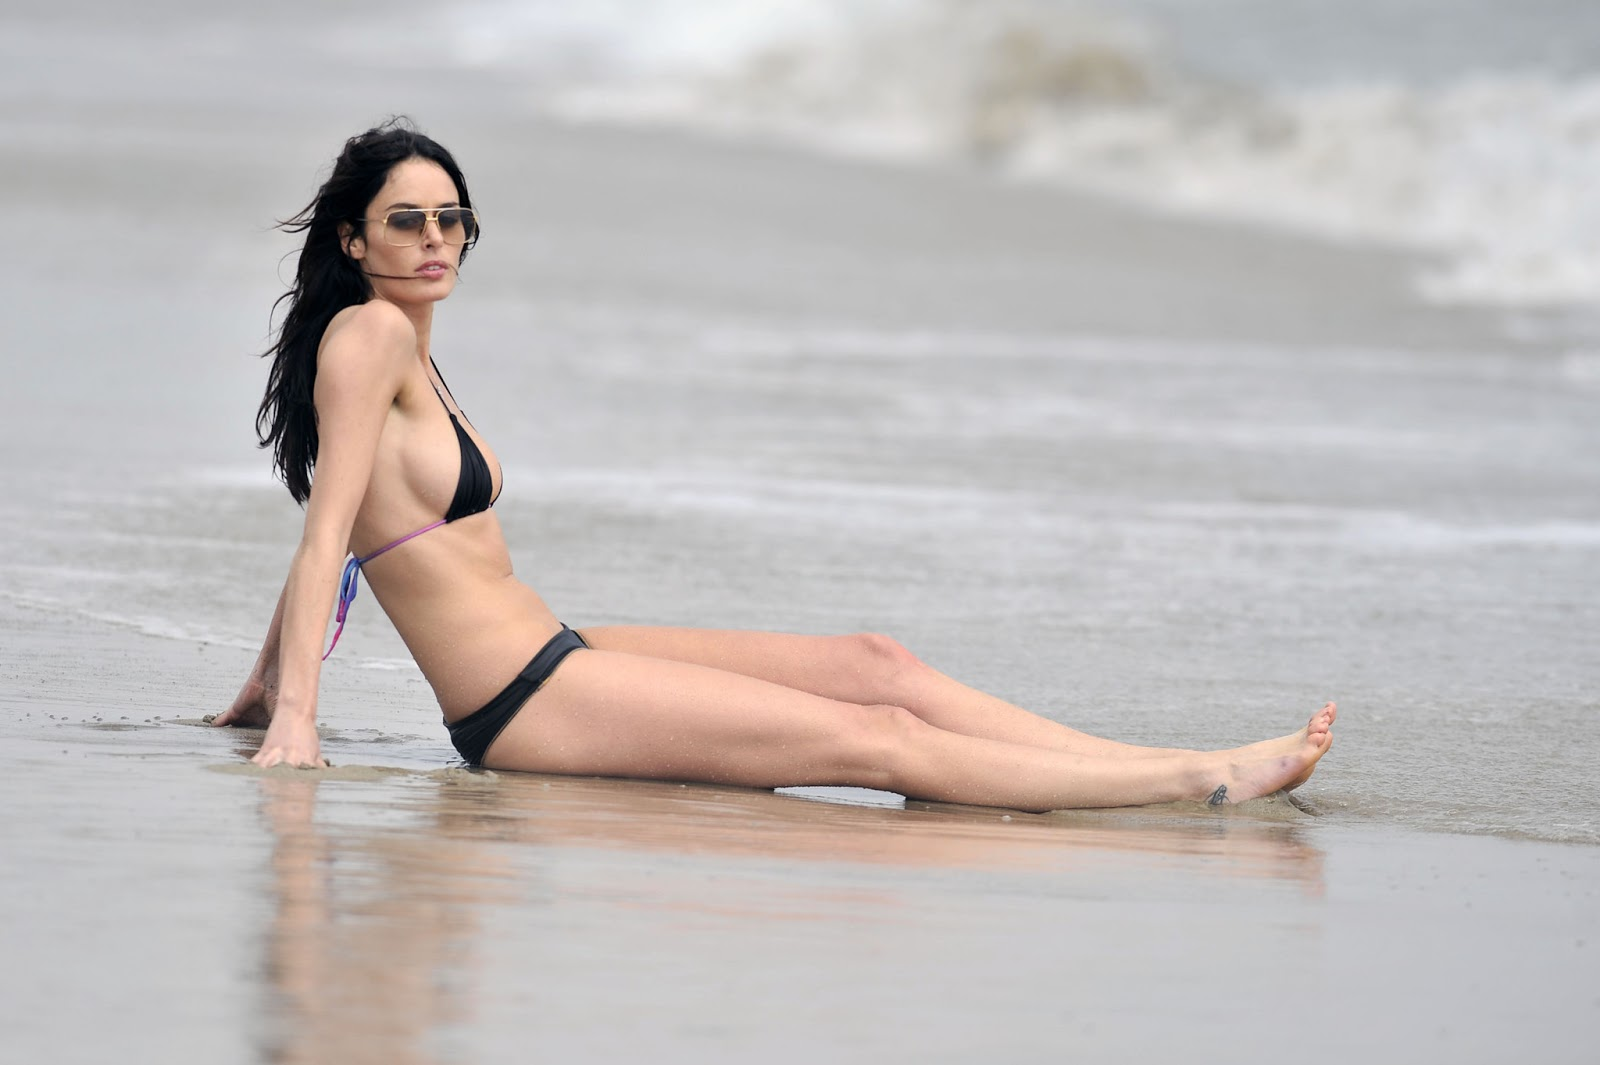 Feet Nicole Trunfio nude photos 2019